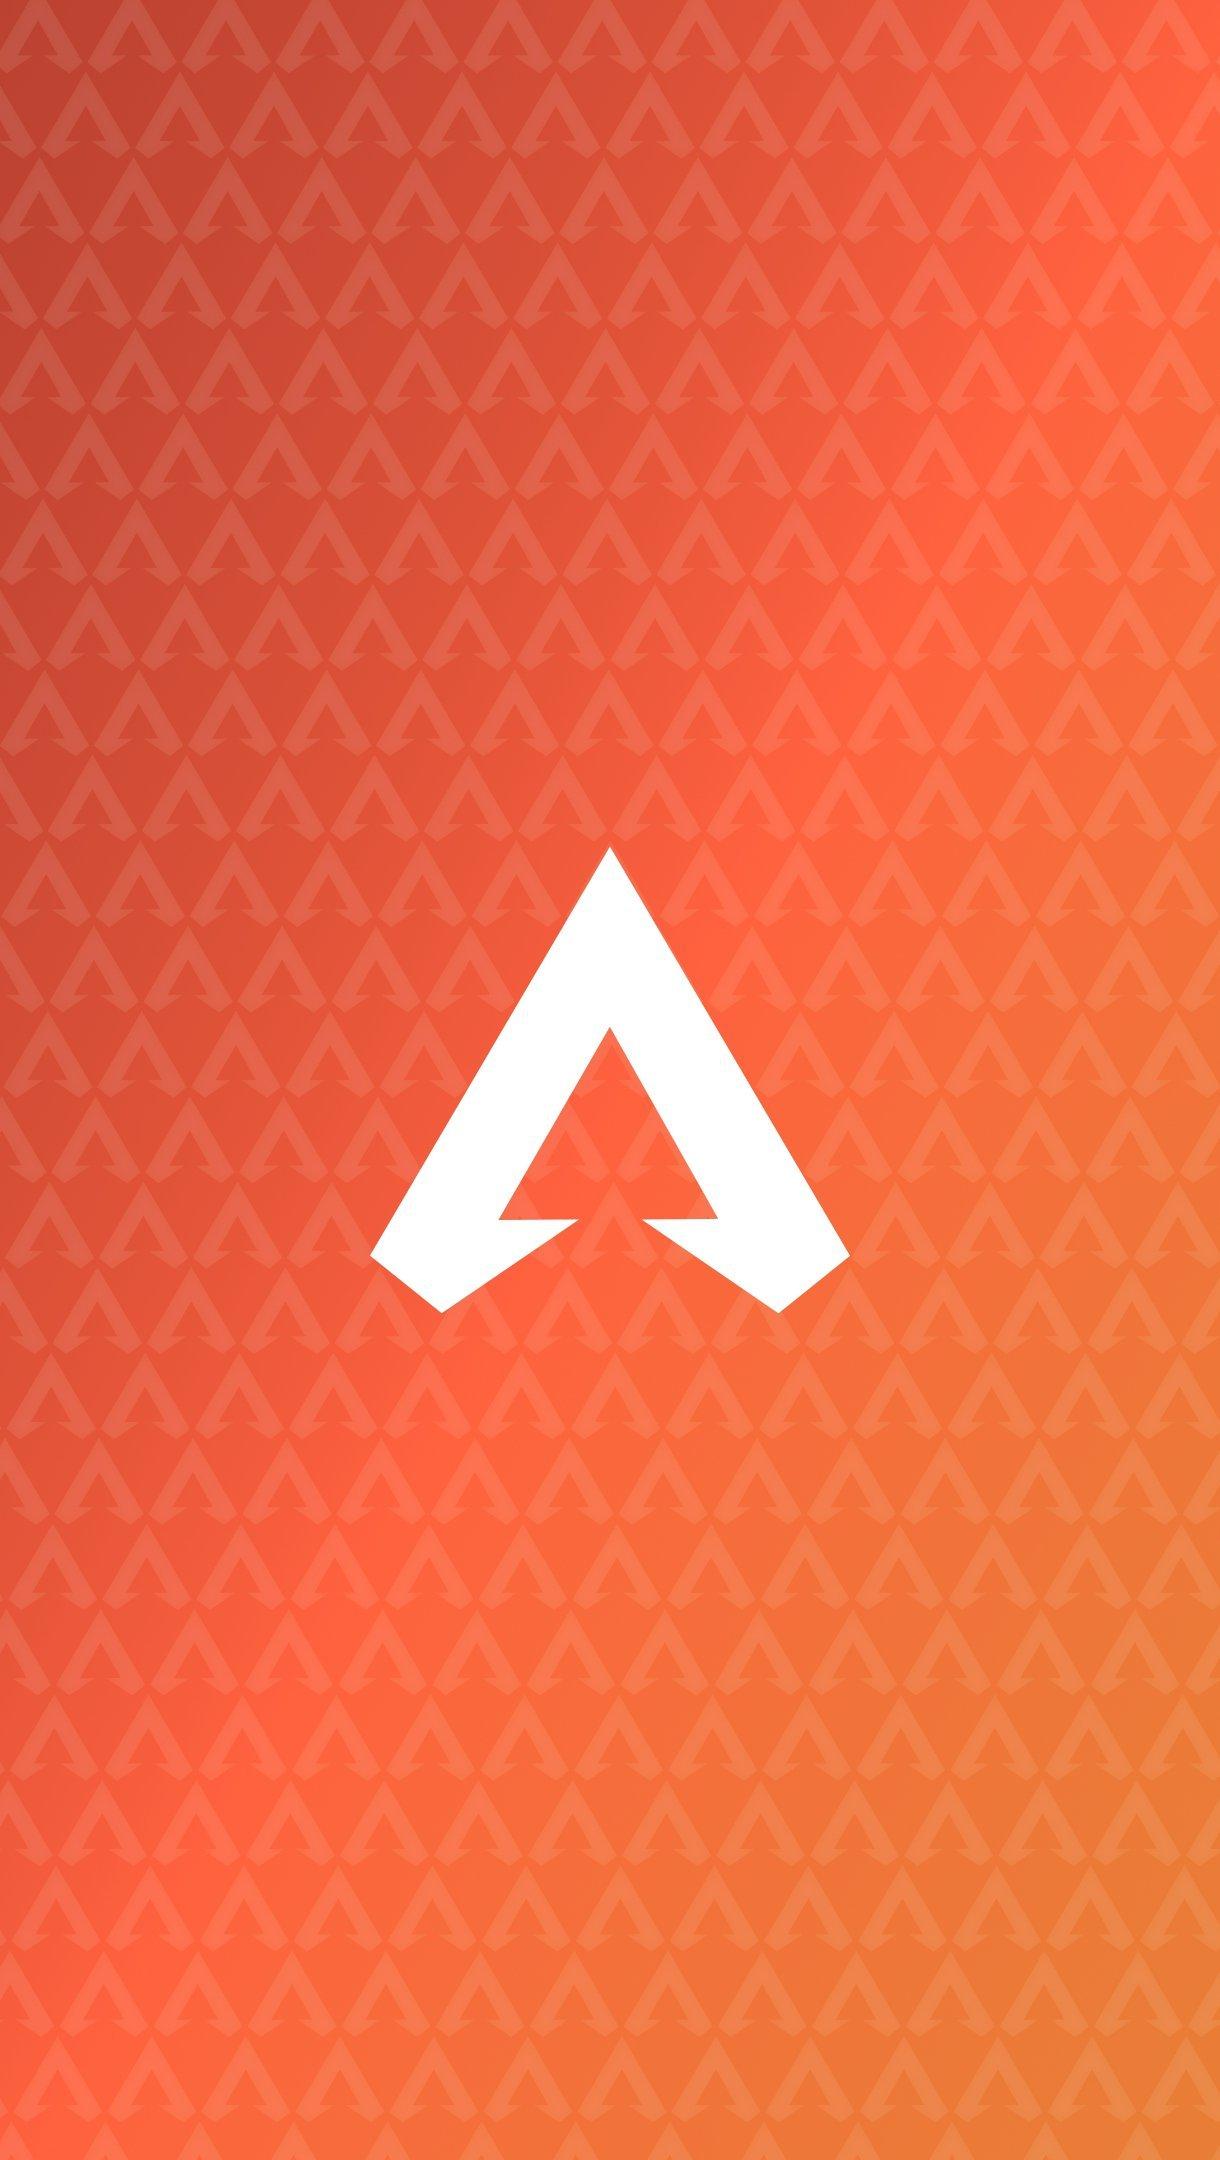 Wallpaper Apex Legends logo Vertical